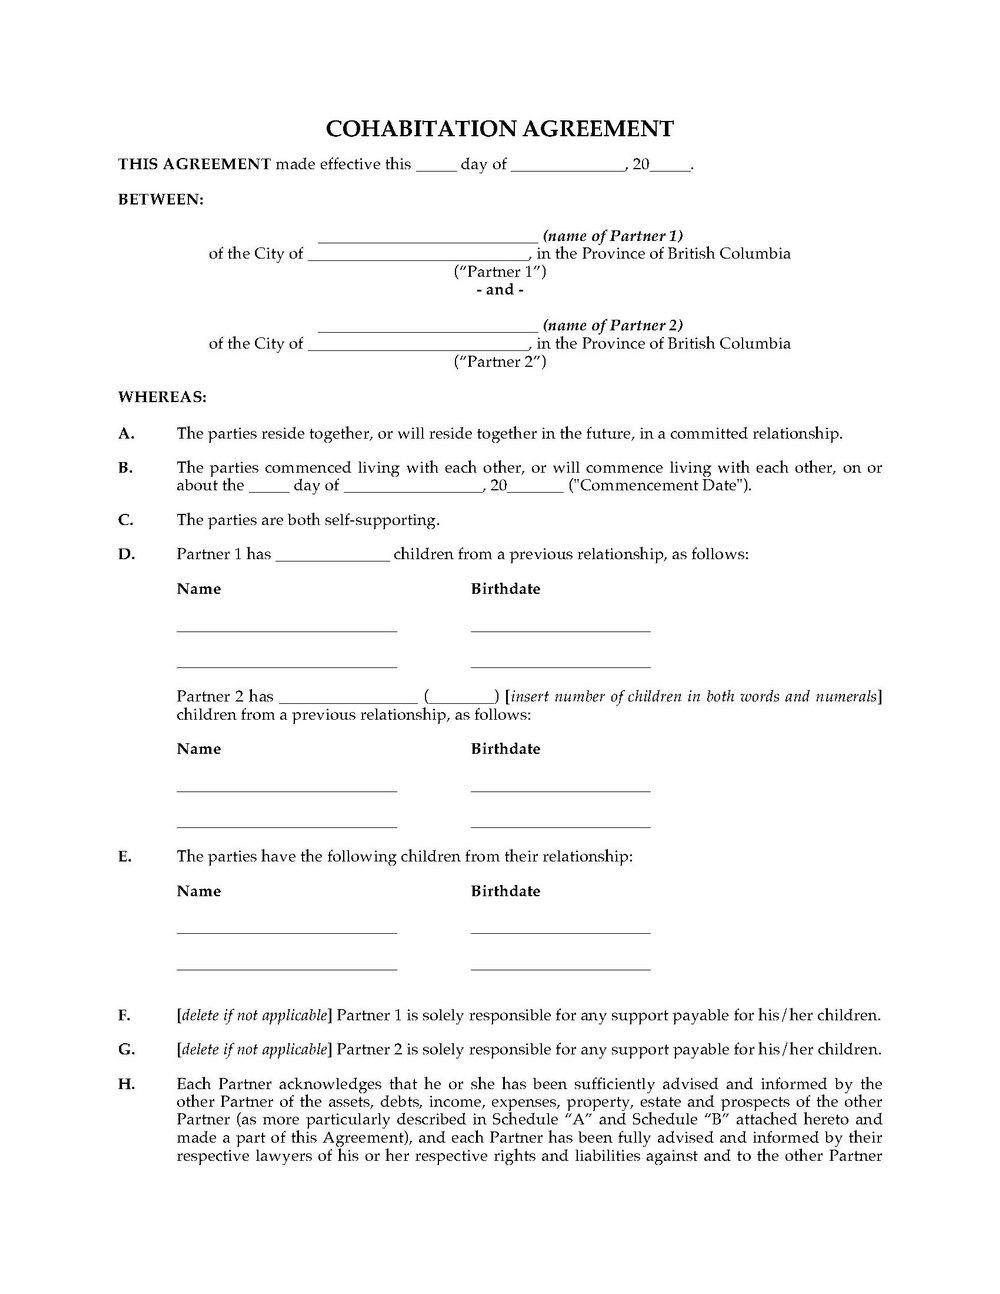 Cohabitation Agreement Form